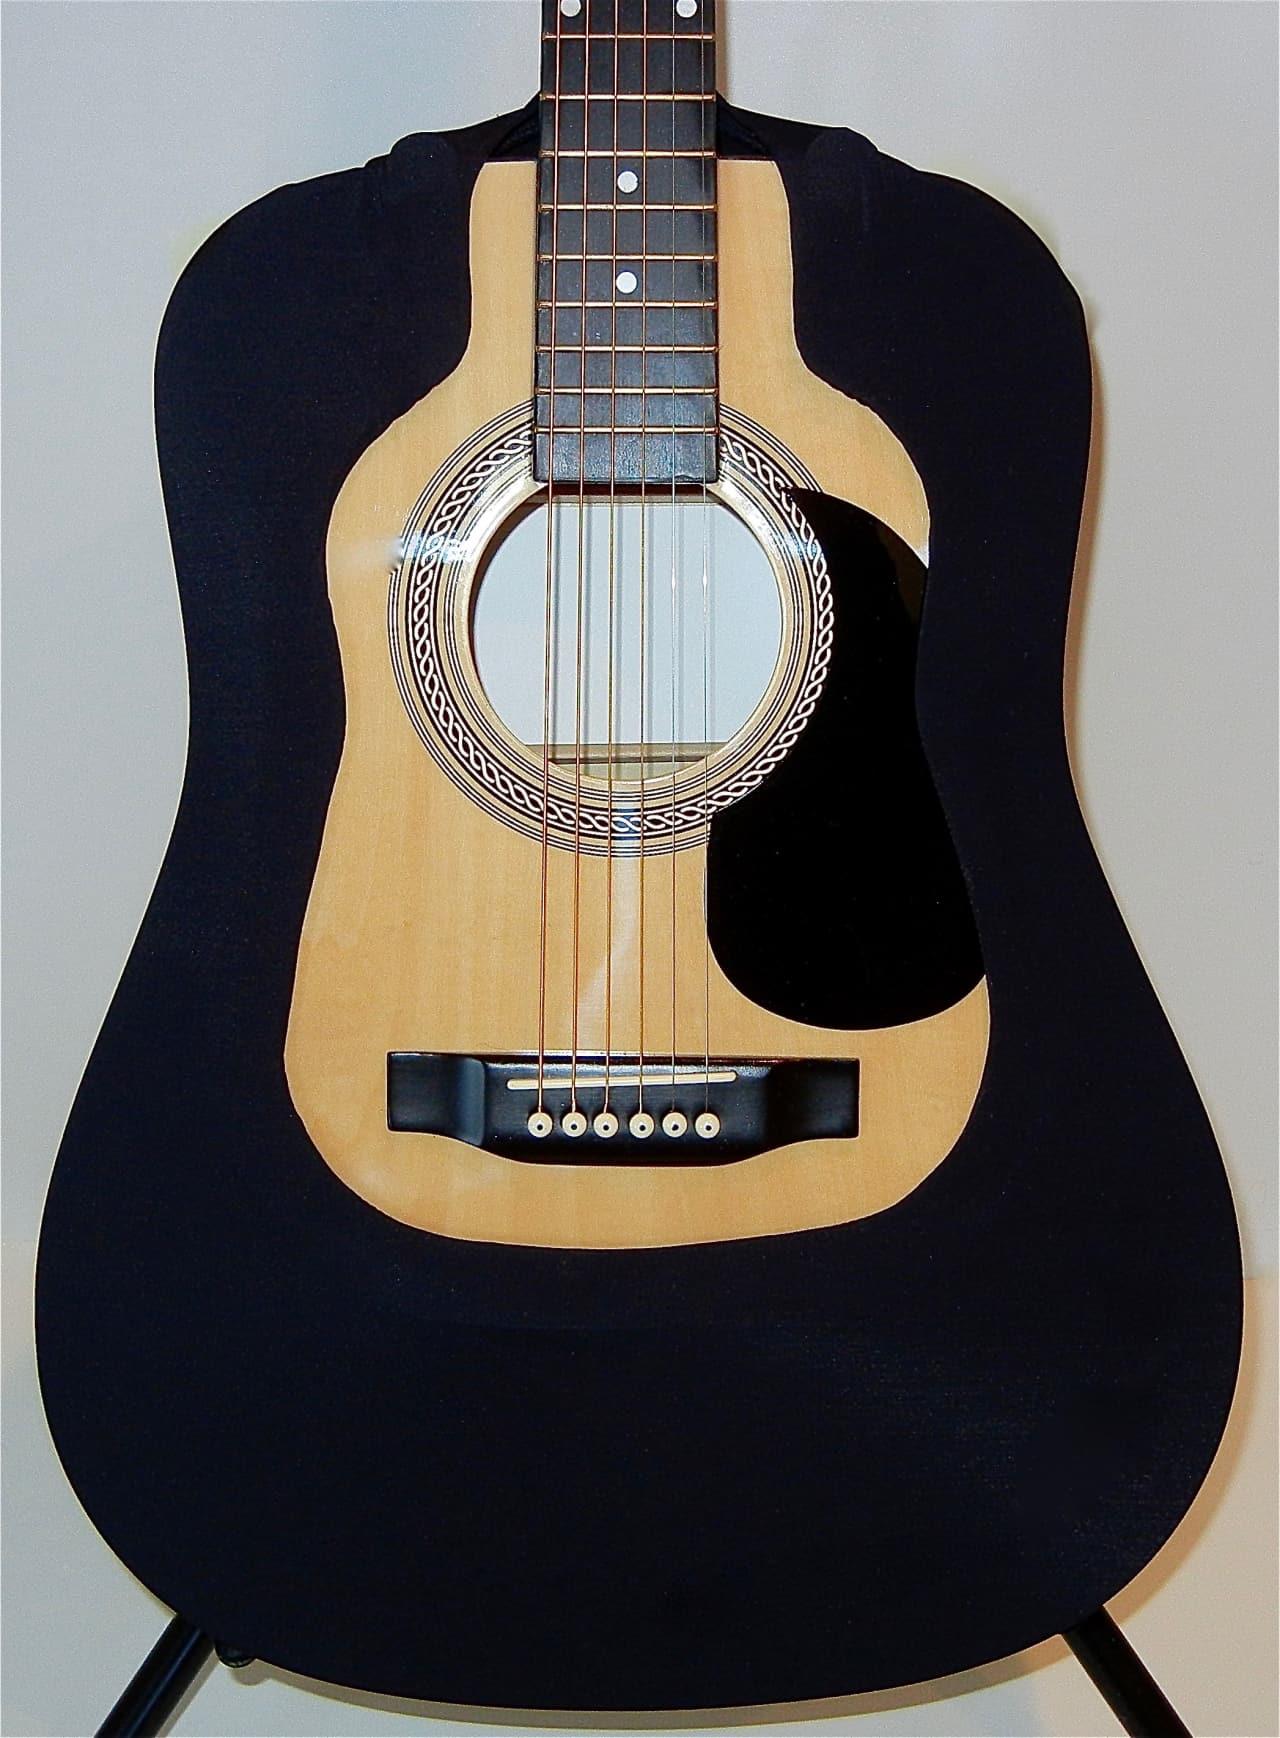 Acoustic Guitar Covers : acoustic guitar cover vest black dread fits martin reverb ~ Vivirlamusica.com Haus und Dekorationen